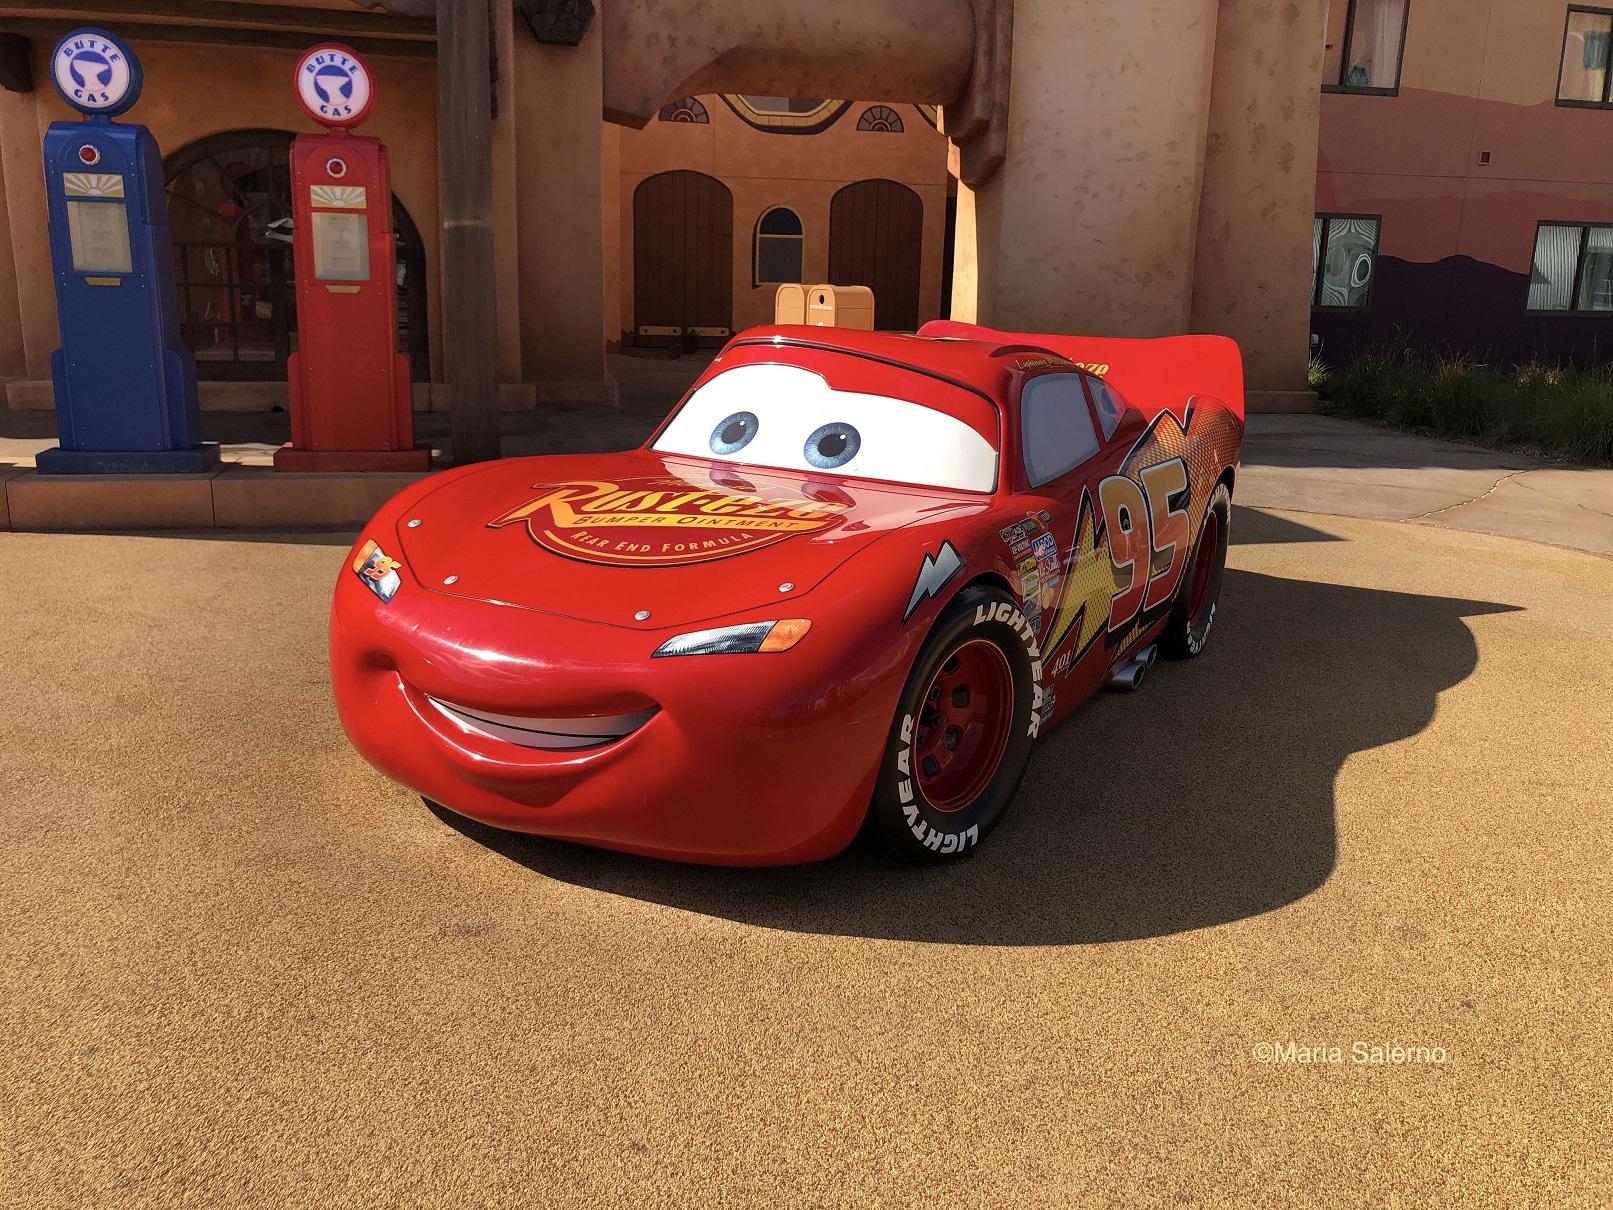 Cars at Disney